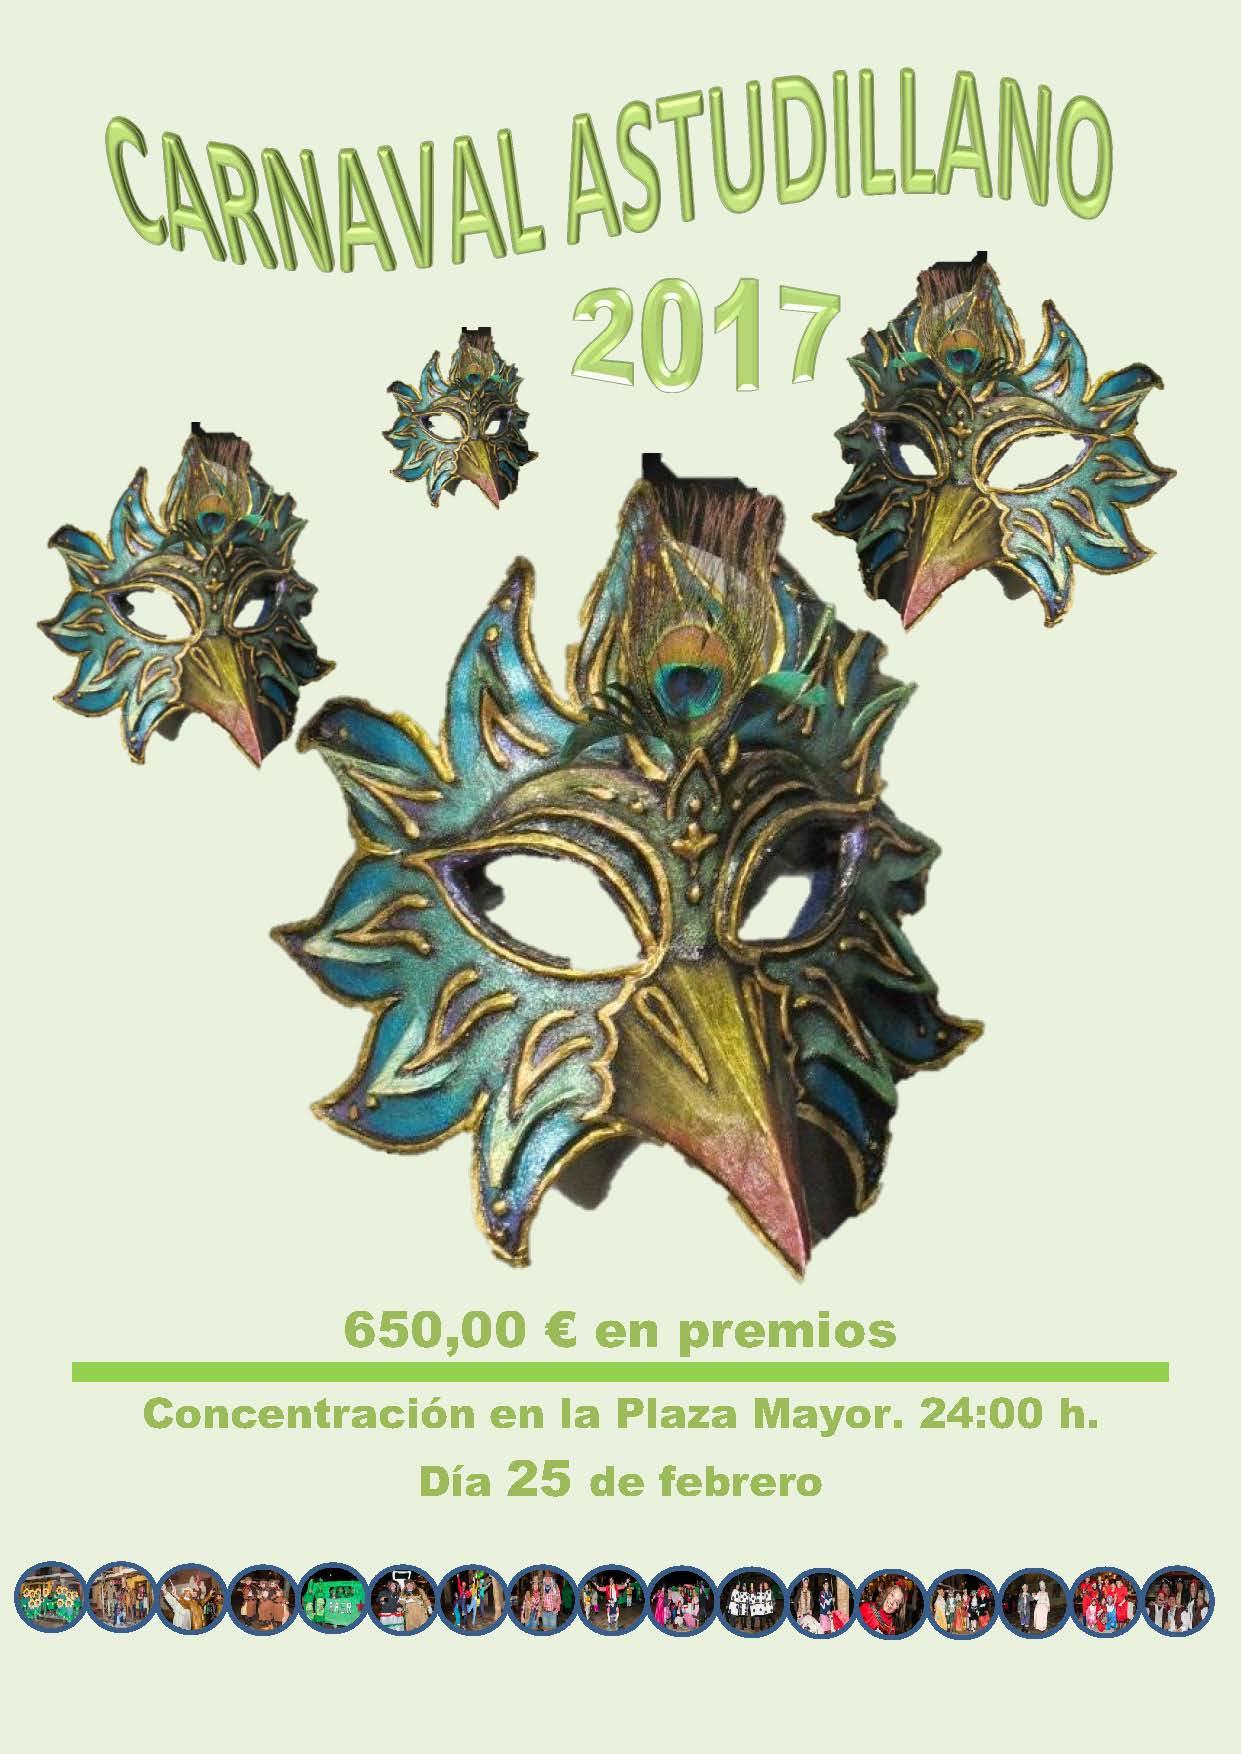 Carnaval Astudillano 2017